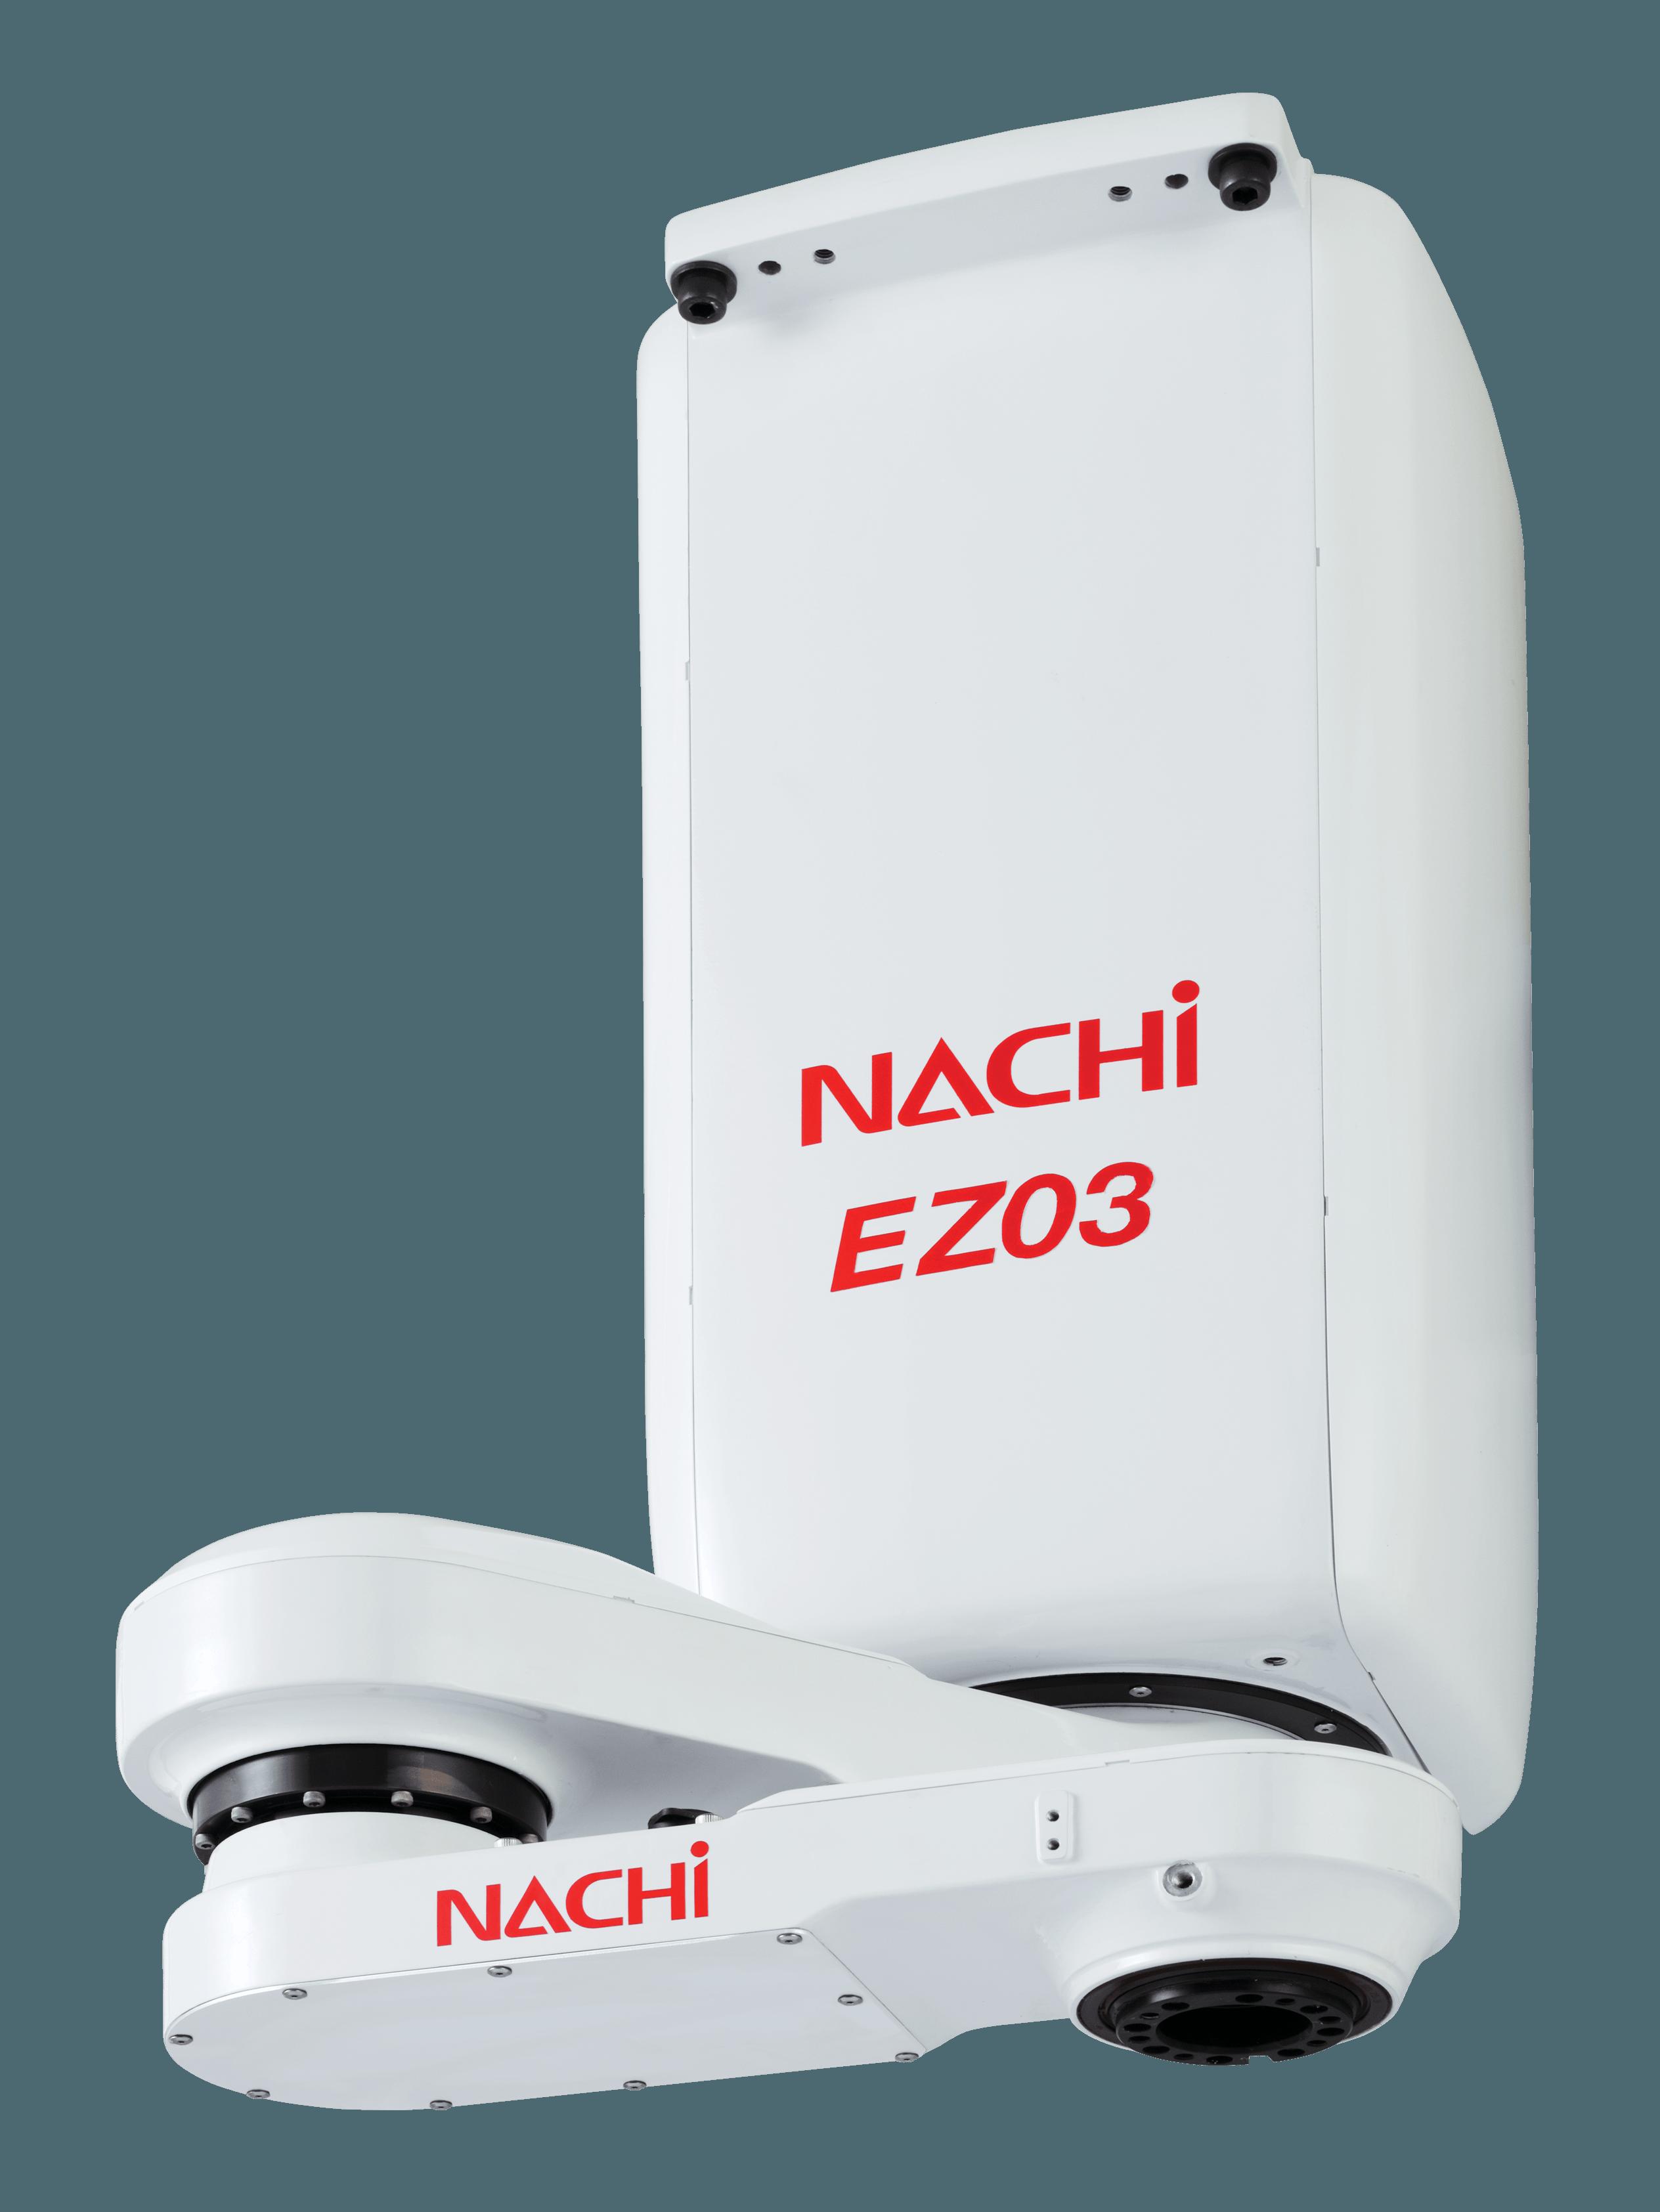 Robot Nachi